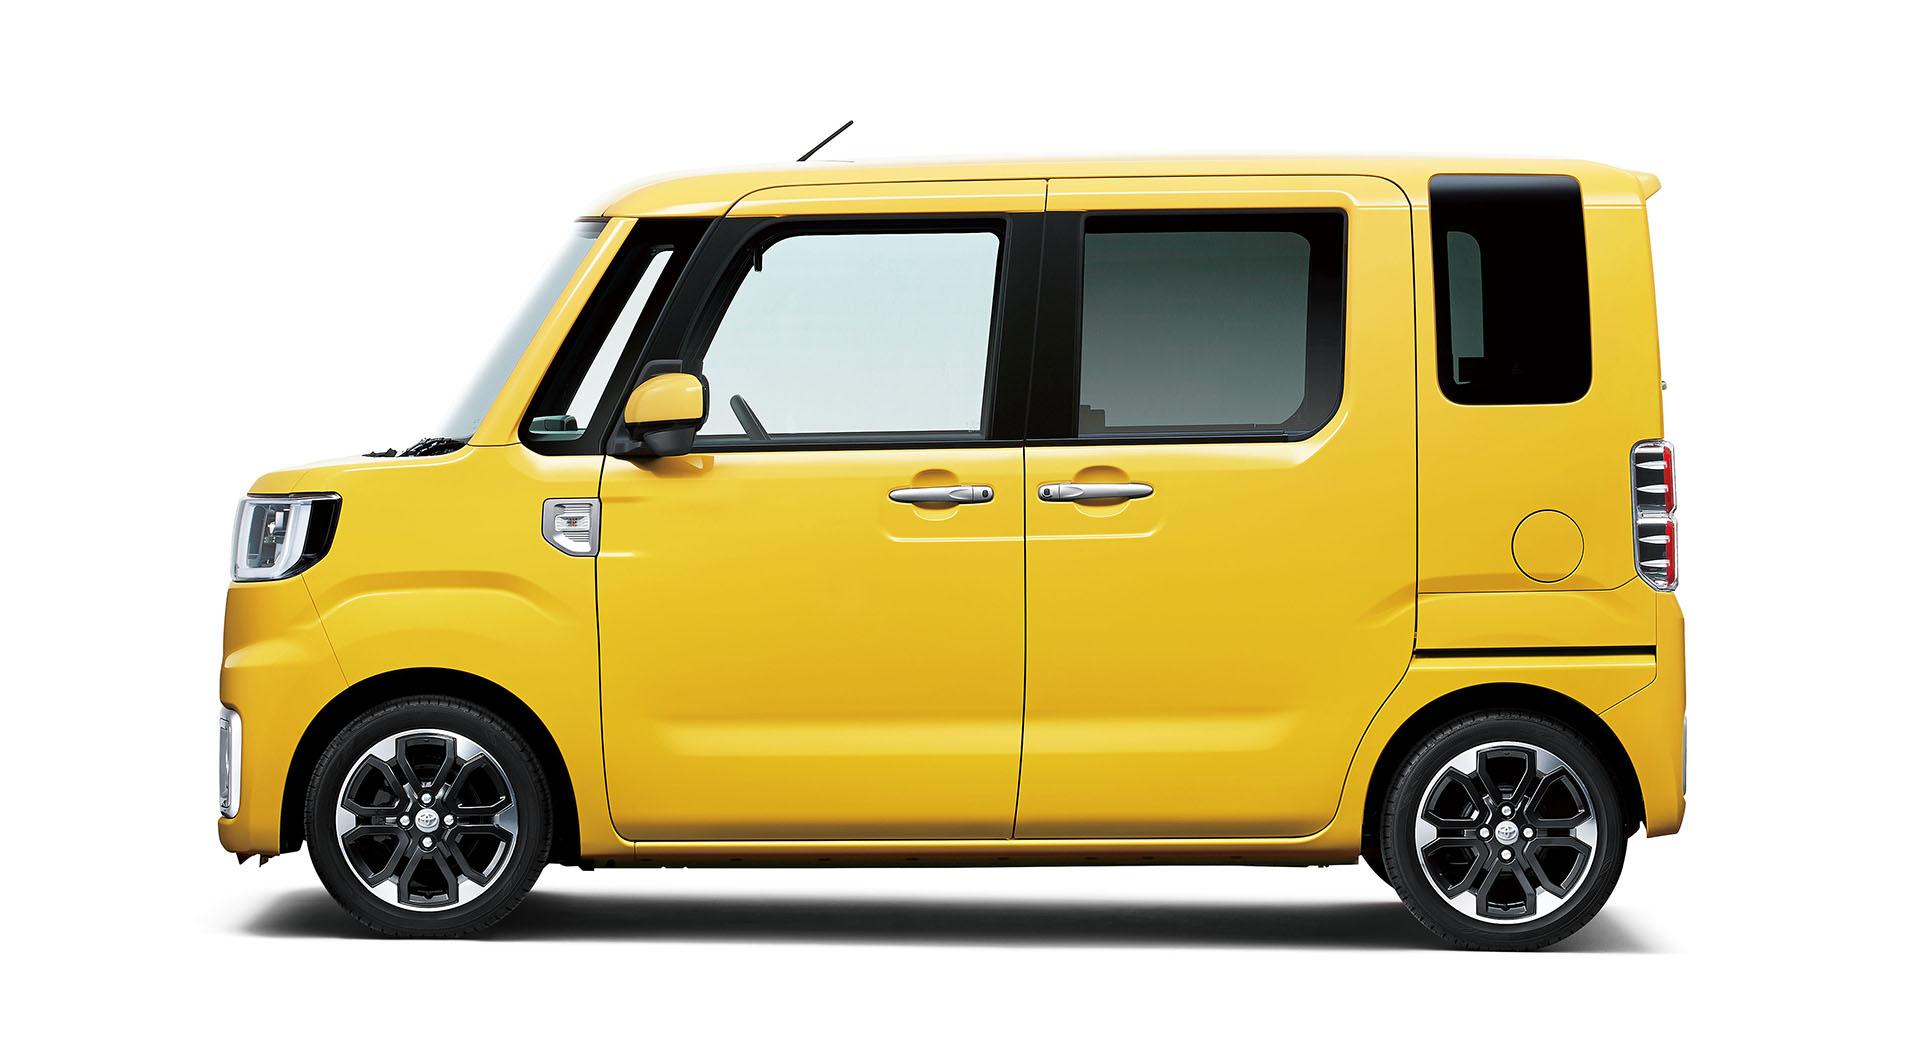 Toyota Pixis Mega is Japan's Newest Ultra-Cute Kei Car ...